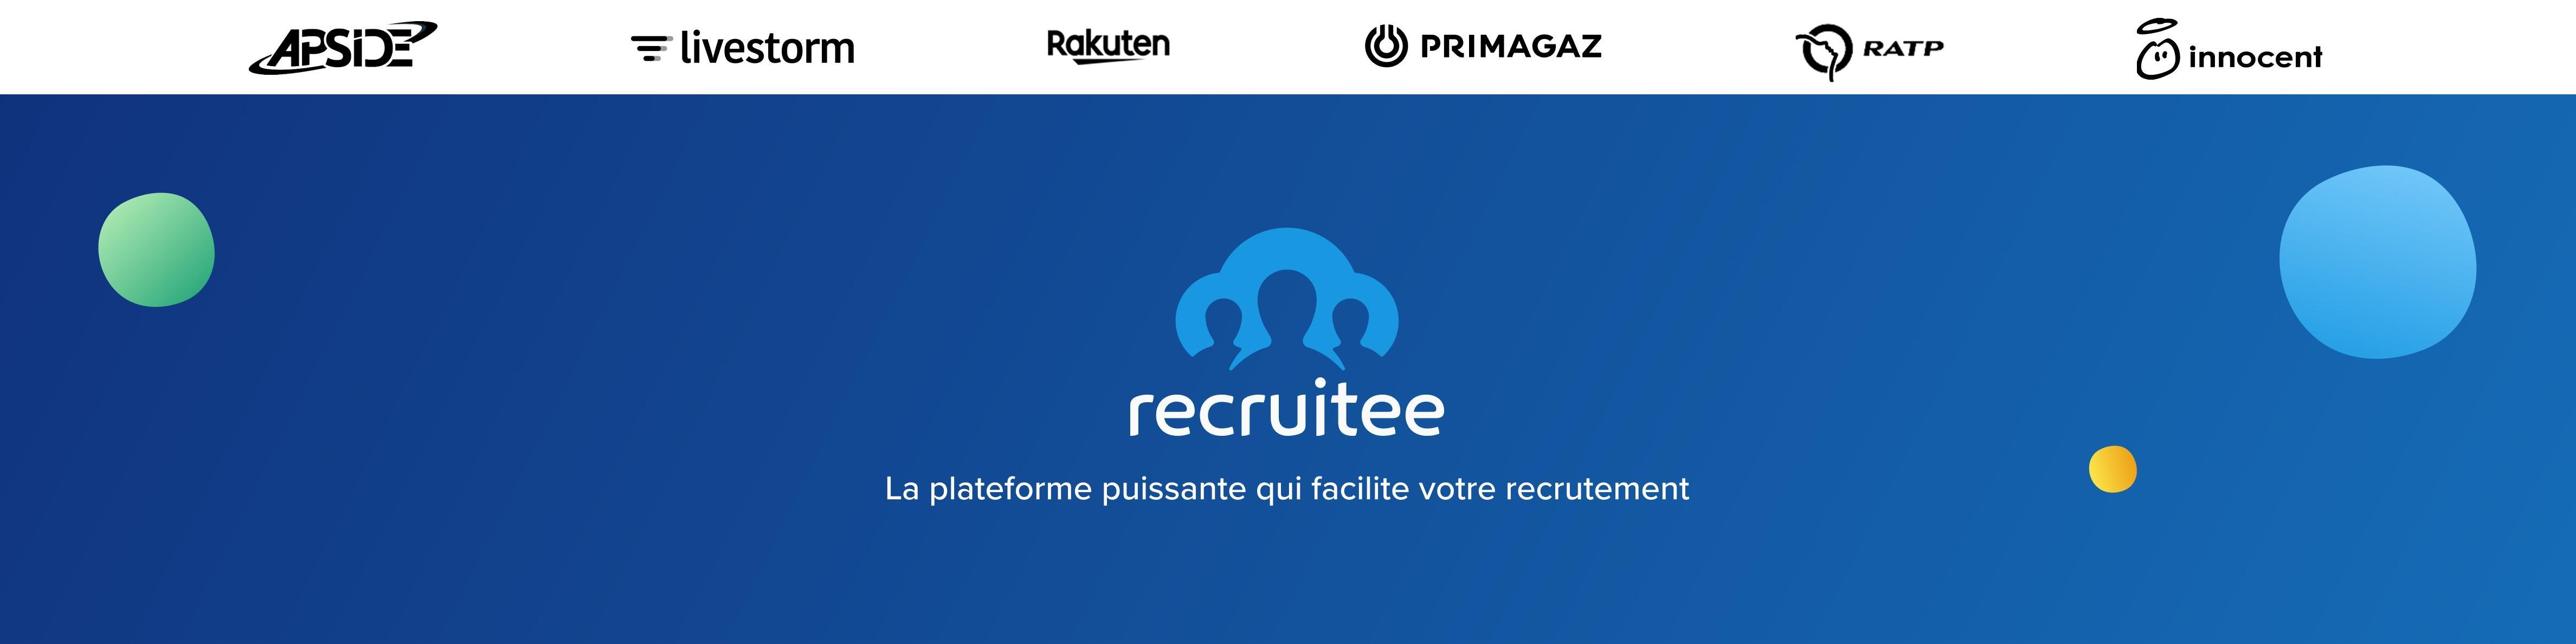 Avis Recruitee : Plateforme de recrutement rapide, facile et collaborative - appvizer